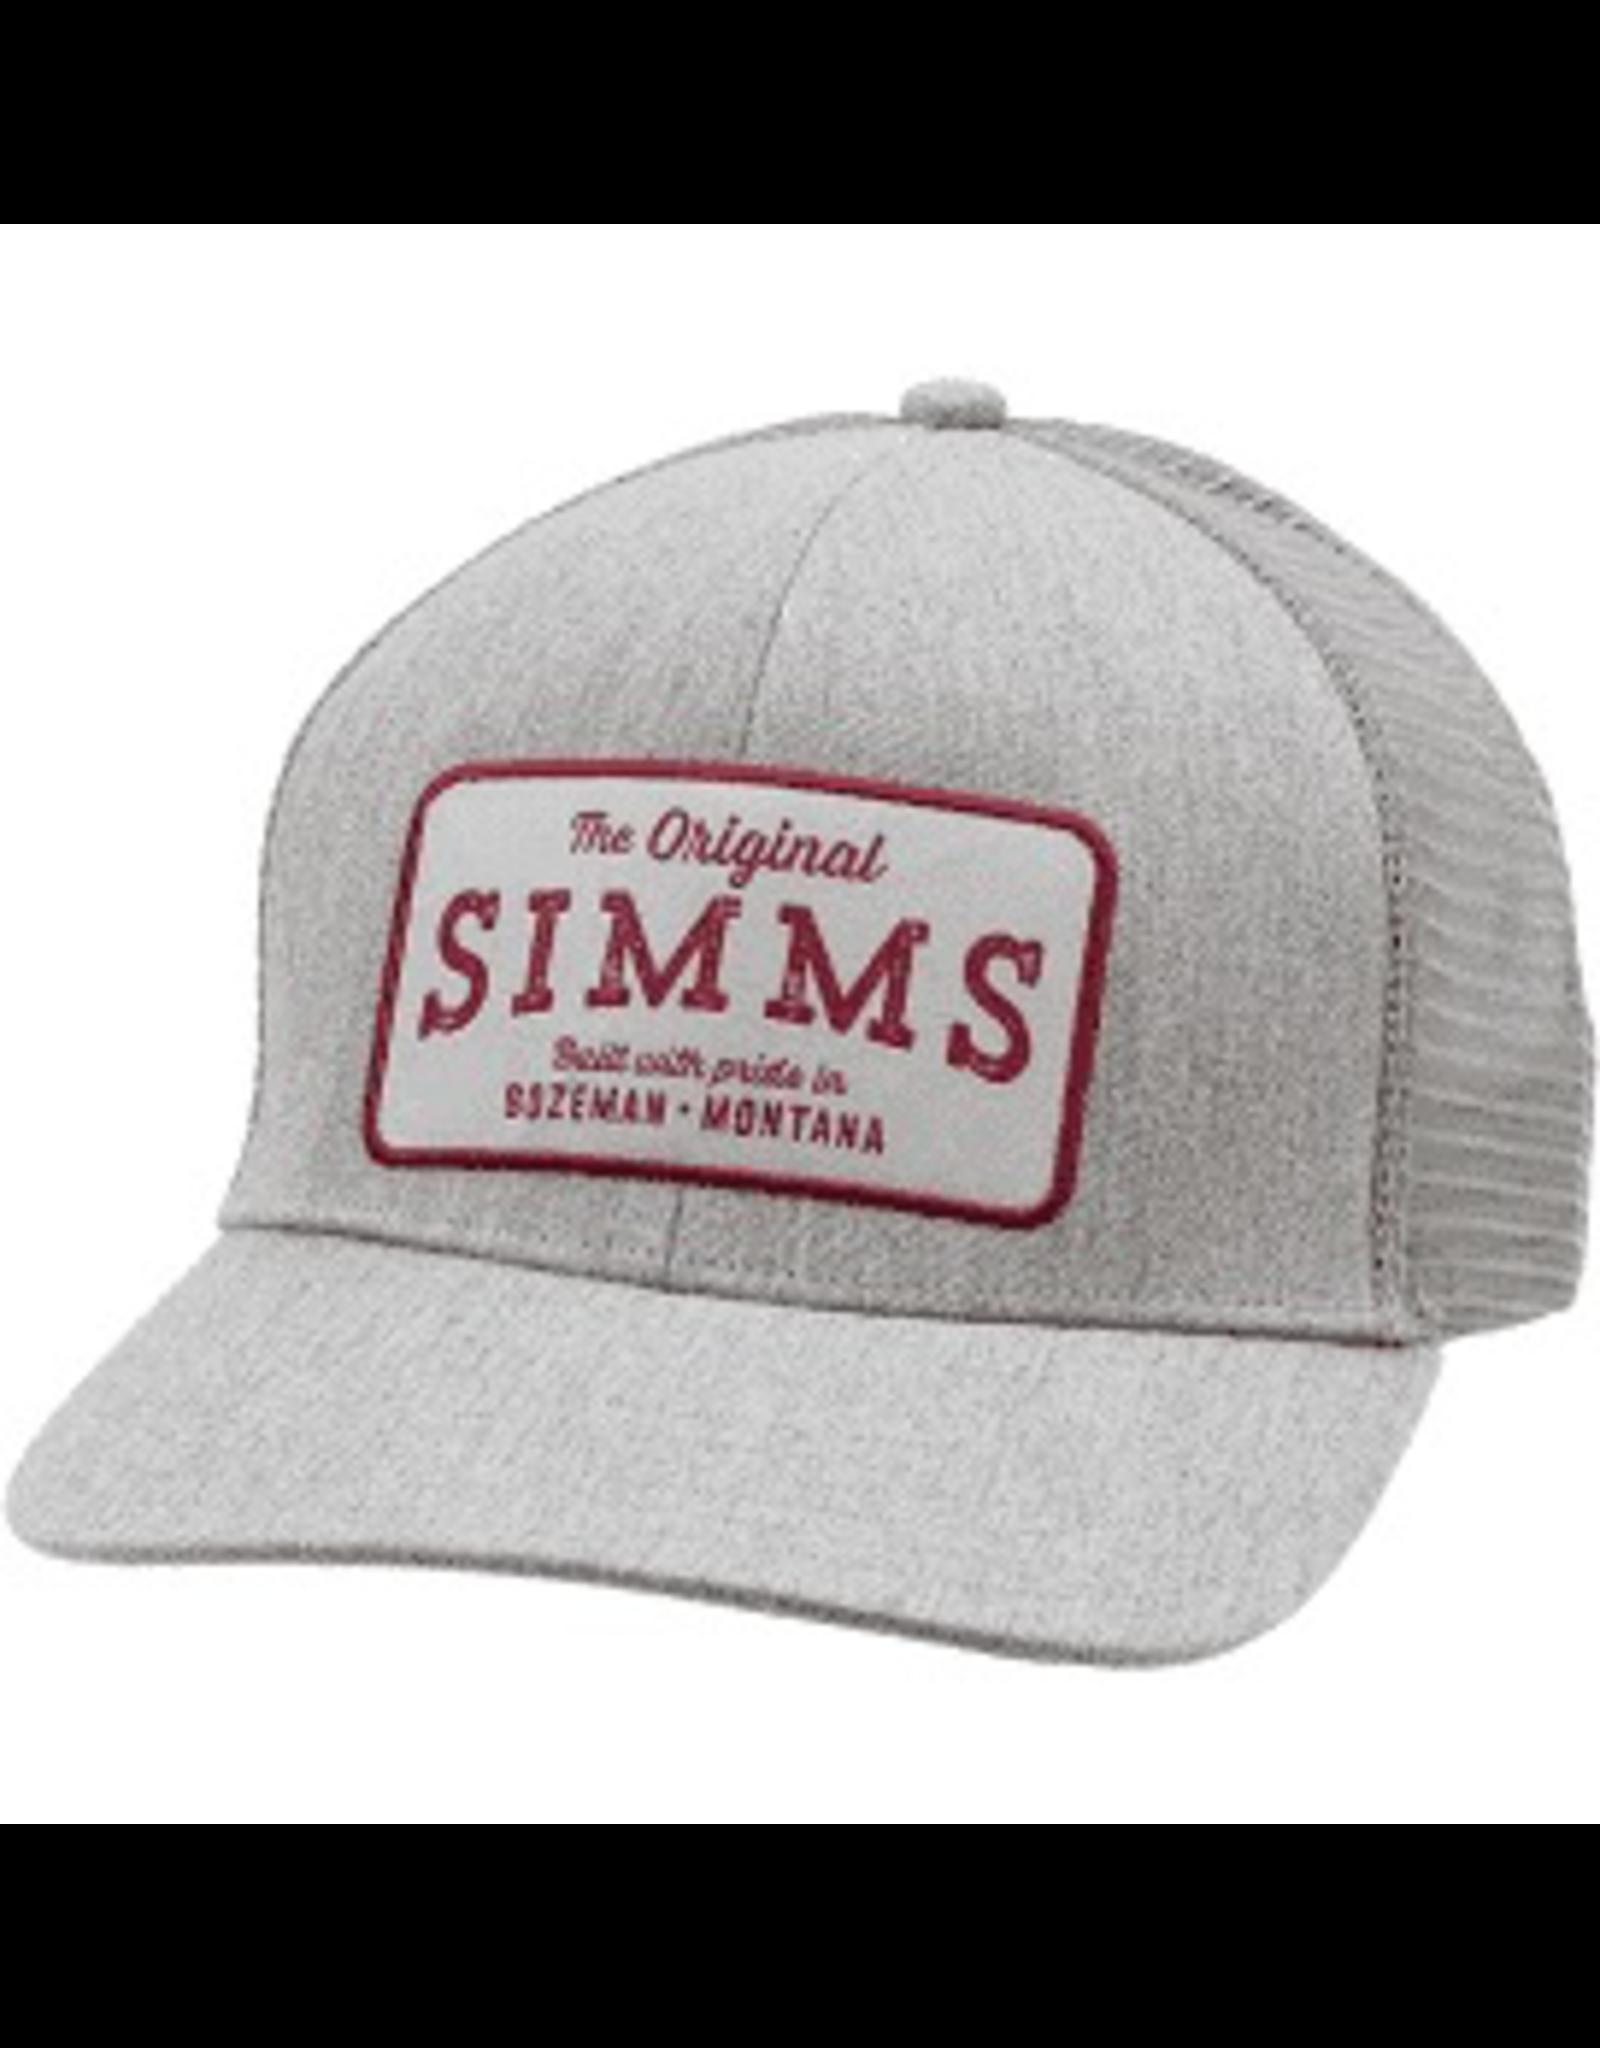 Simms Retro Patch Trucker Hat